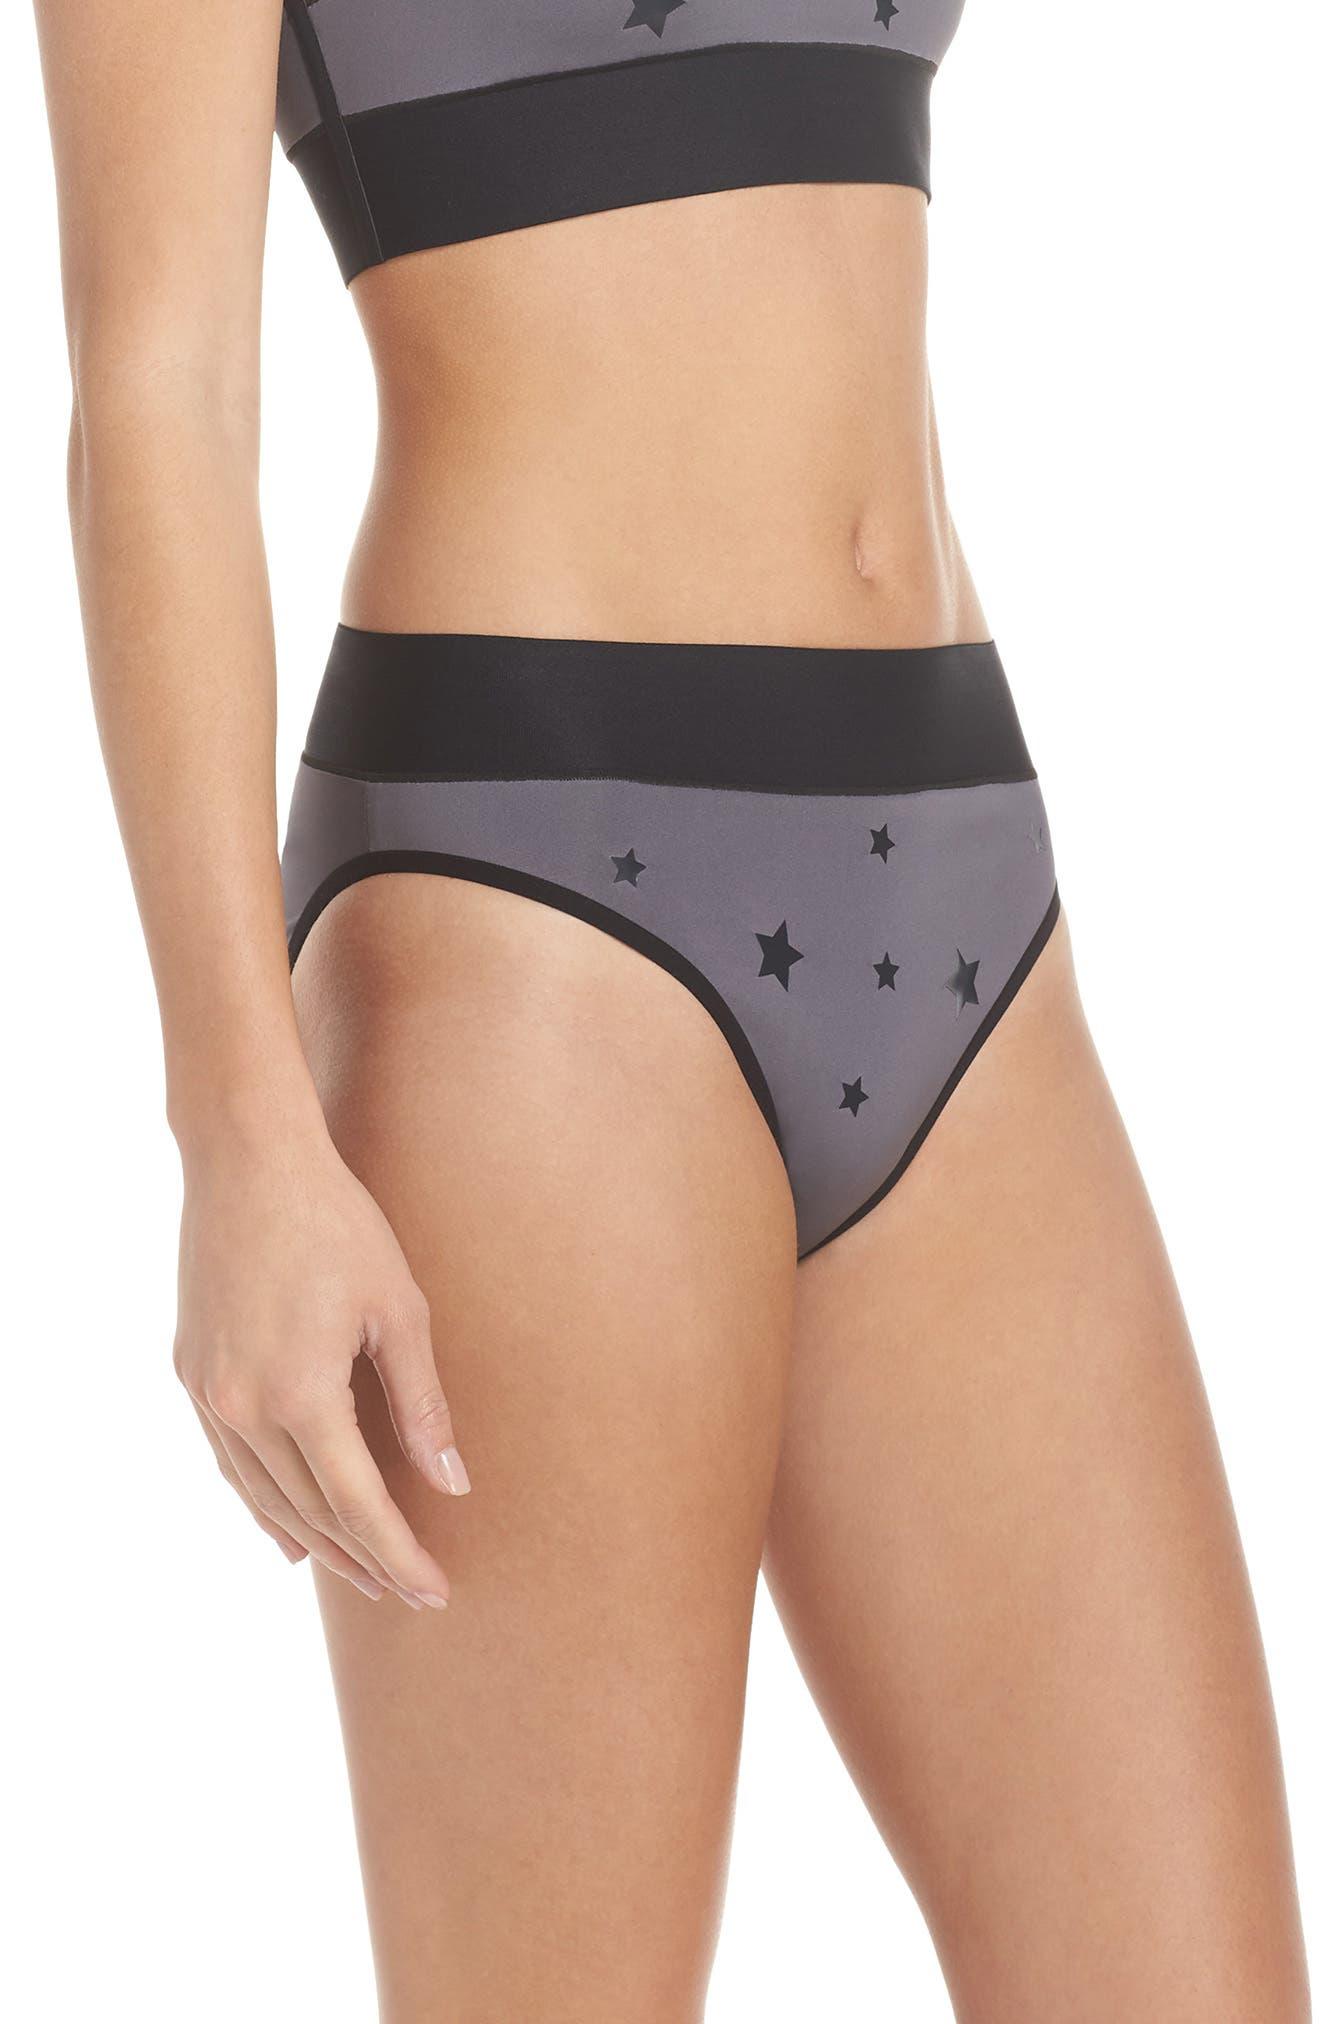 Argon Luster High Waist Bikini Bottoms,                             Alternate thumbnail 3, color,                             020